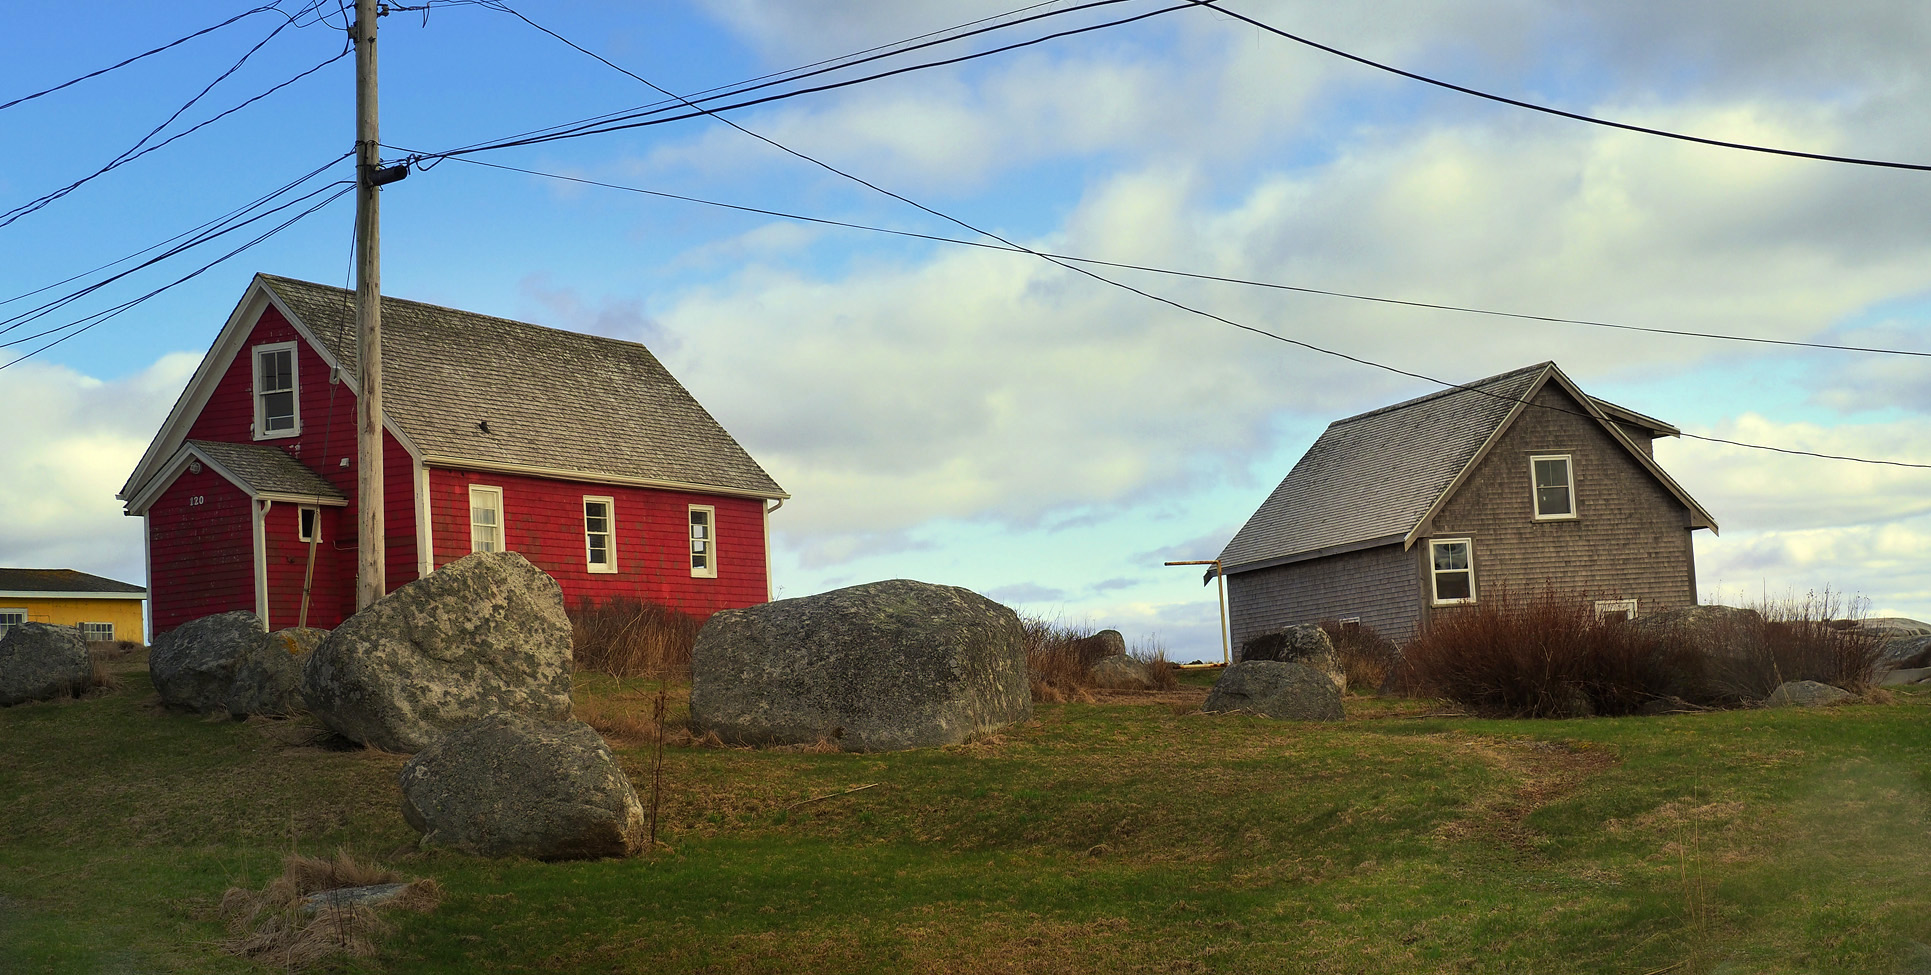 Peggy's Cove Village 2